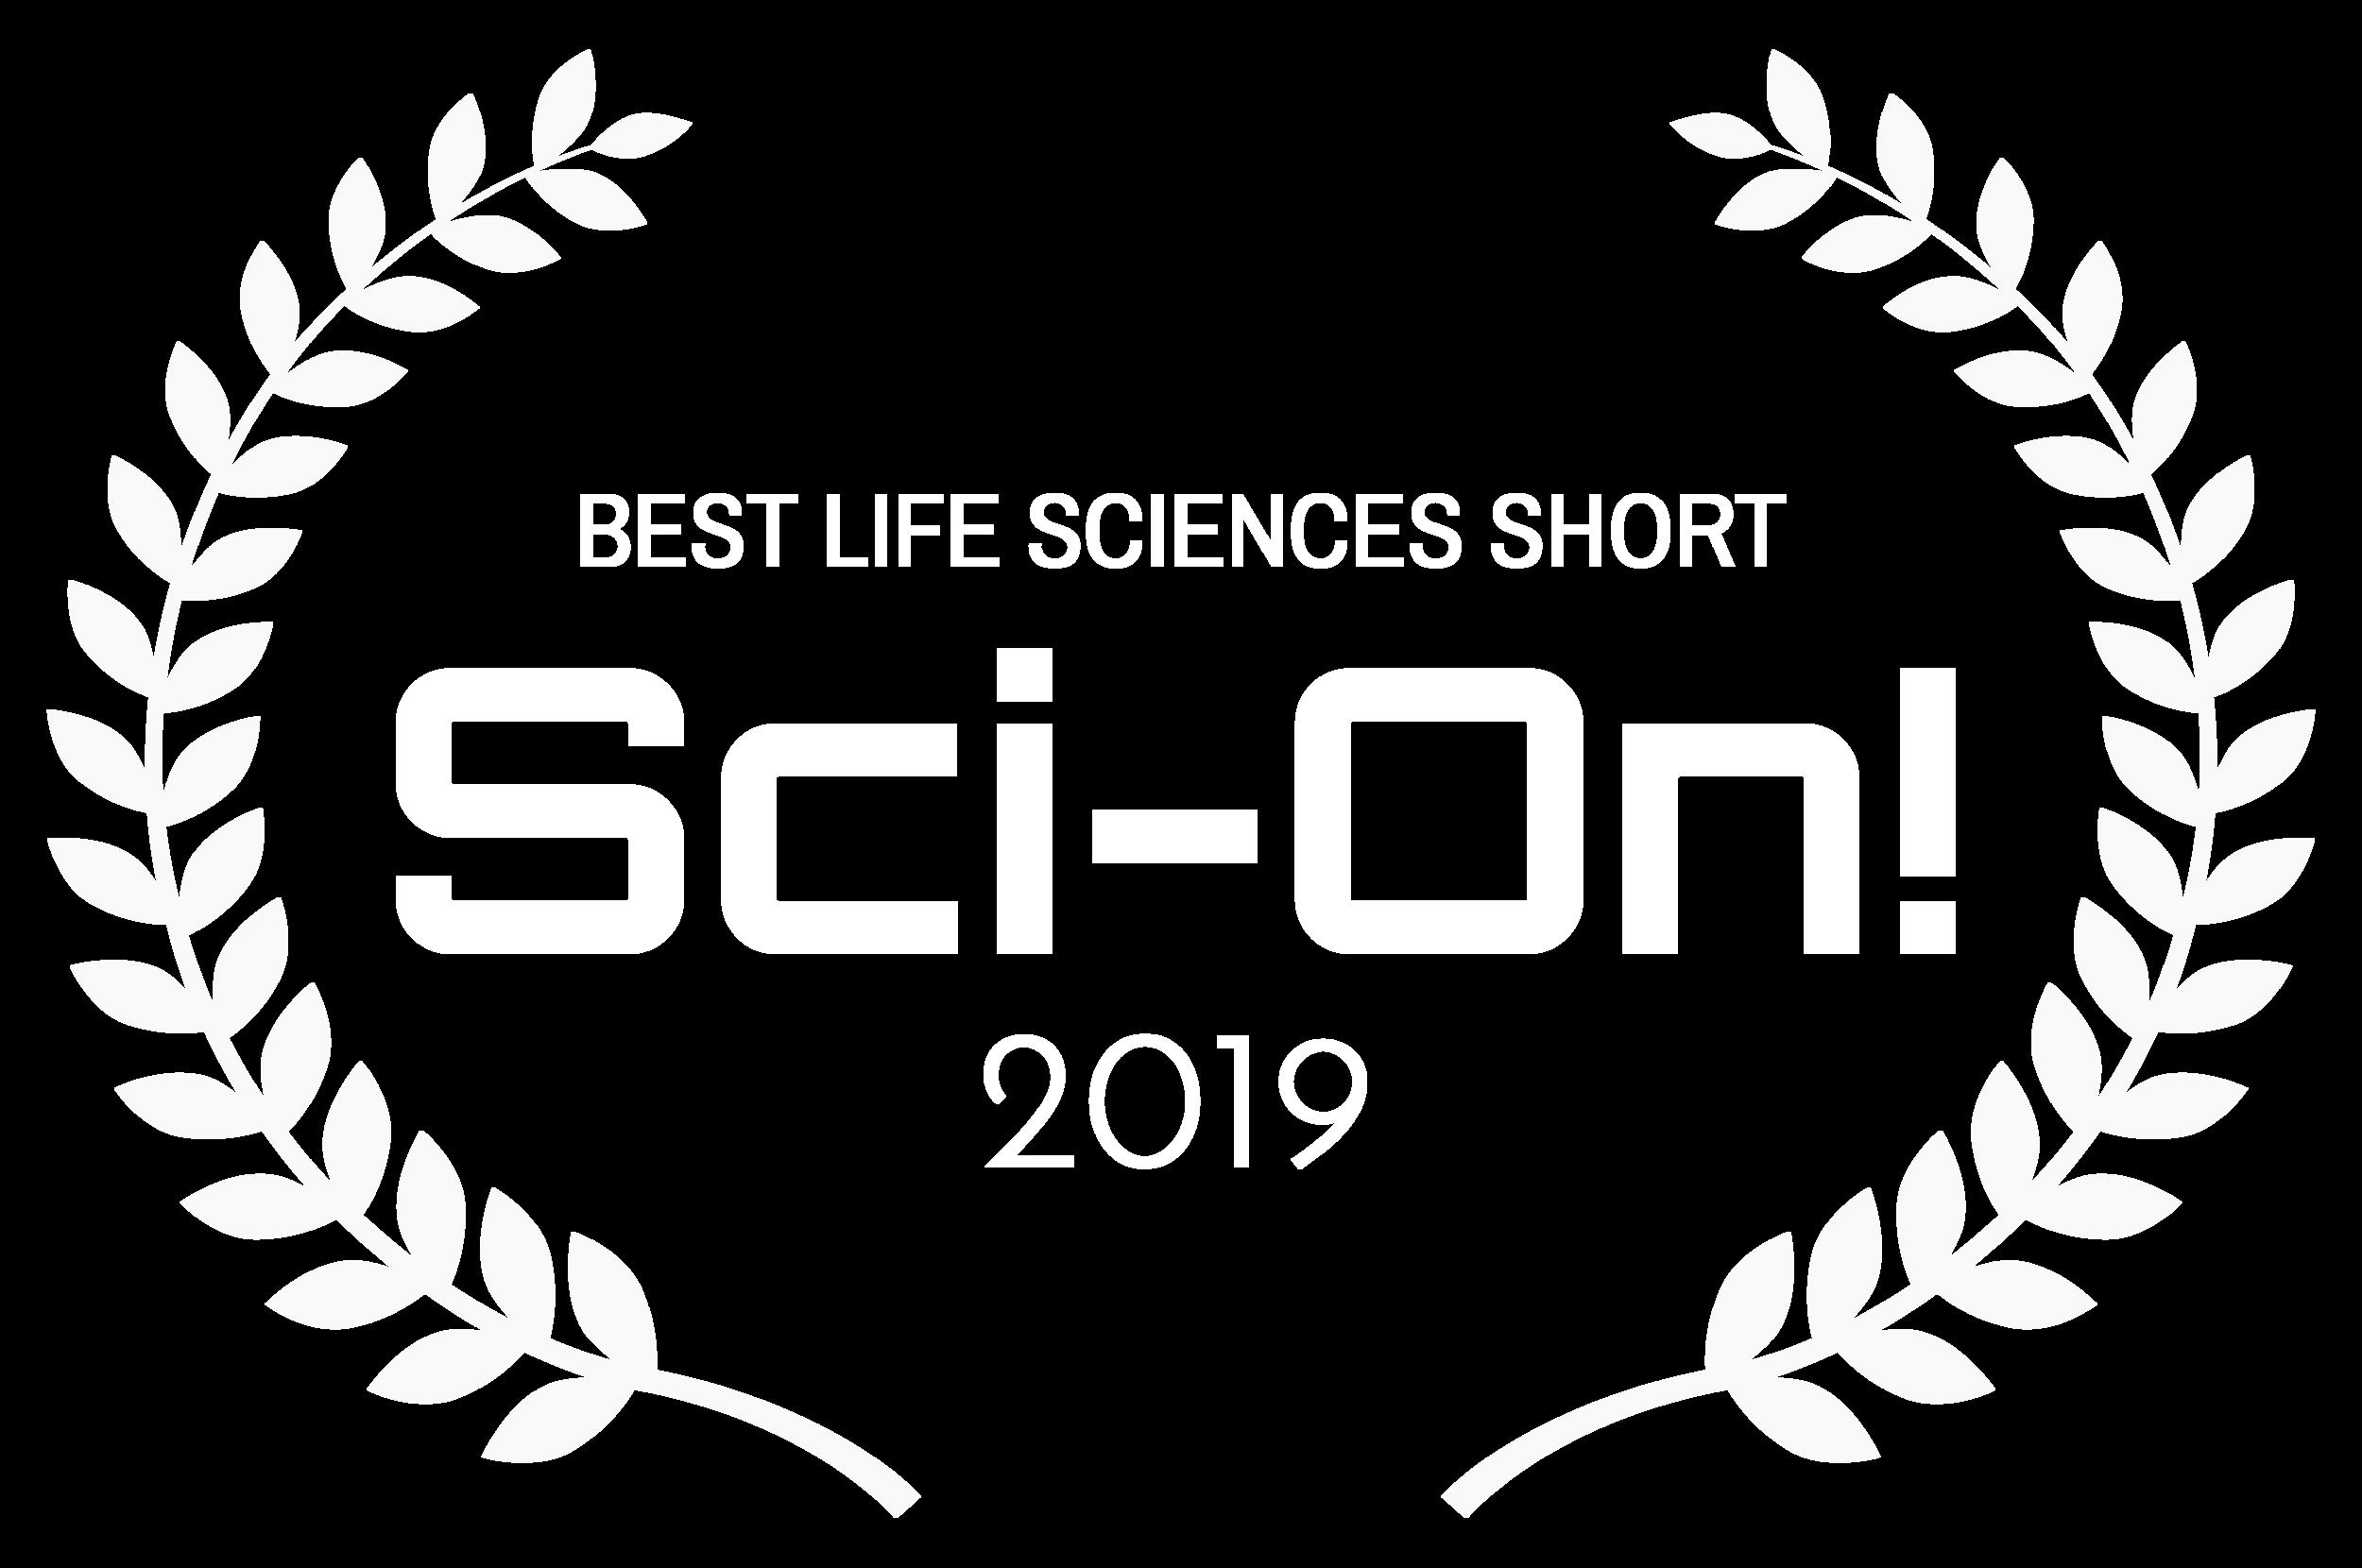 BESTLIFESCIENCESSHORT-Sci-On-2019 copy.png